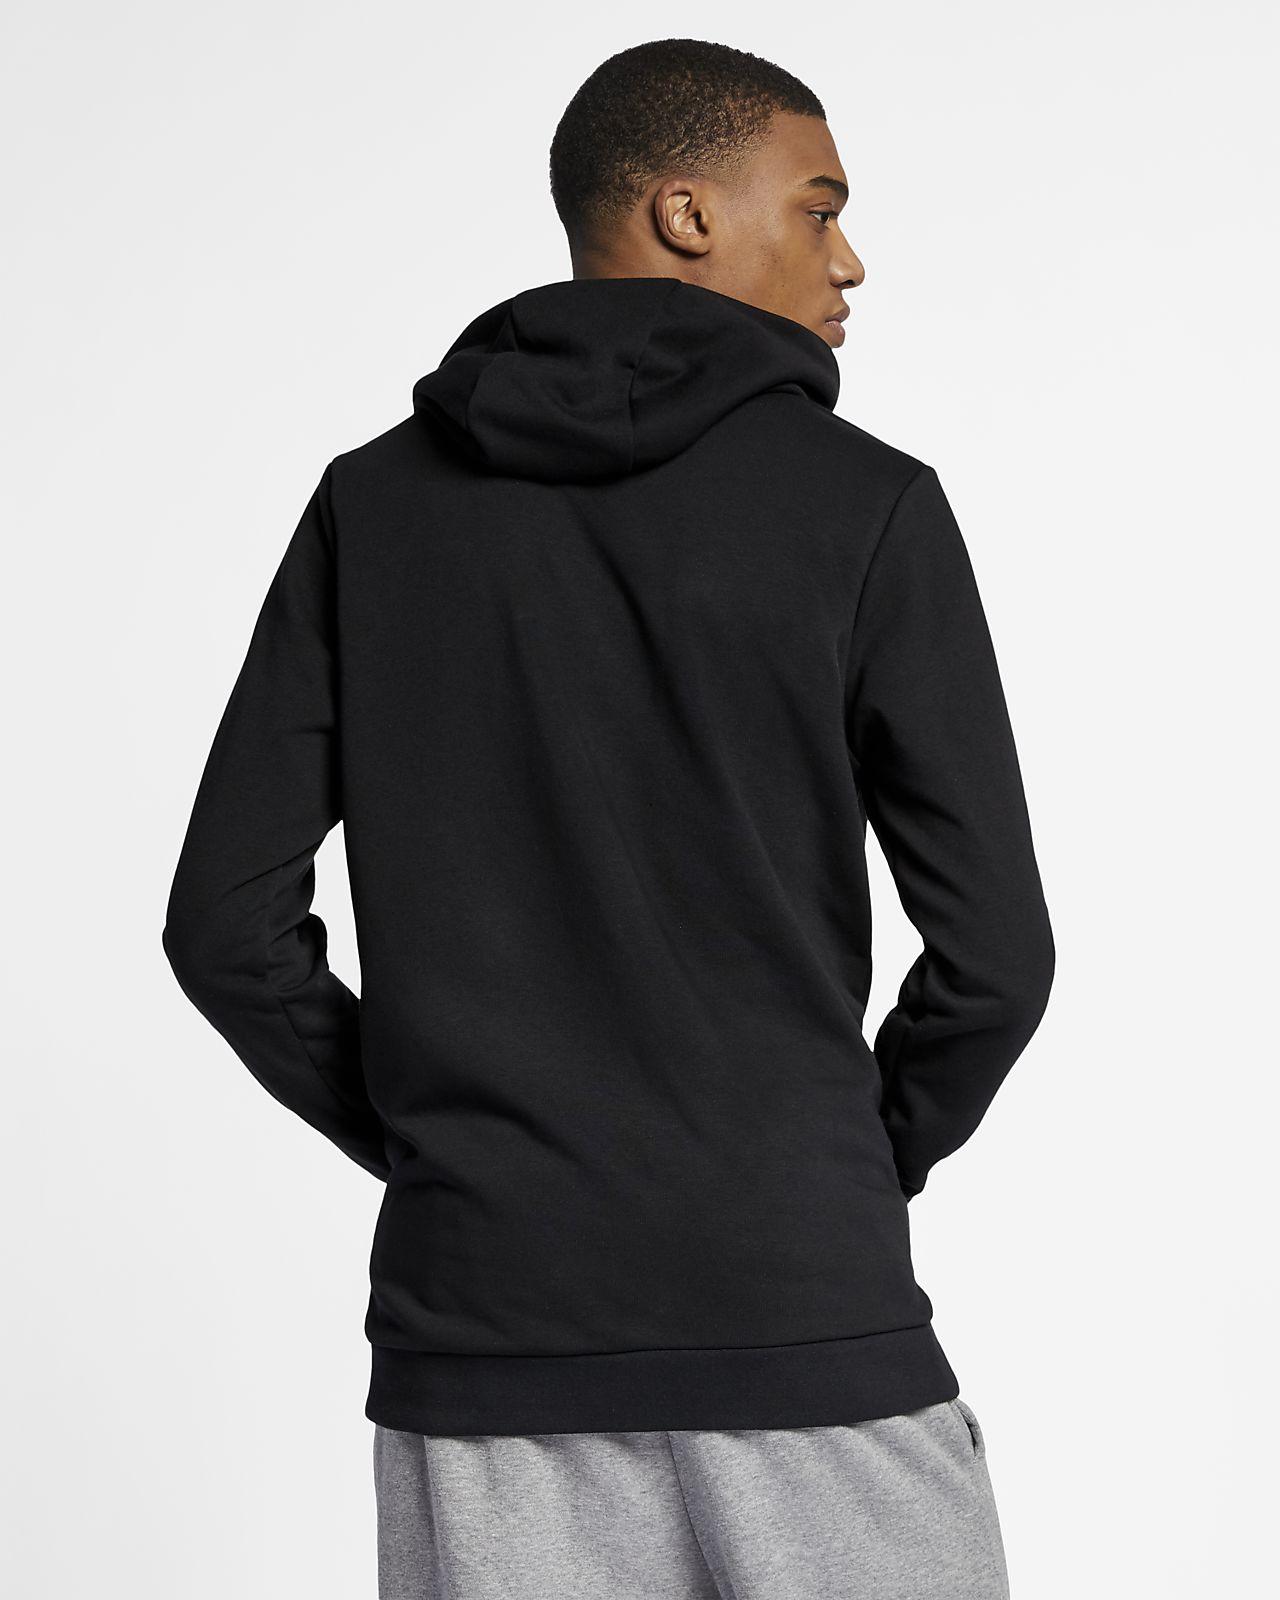 898ad87b4fe6 Jordan Jumpman Air Lightweight Men s Fleece Sweatshirt. Nike.com IE